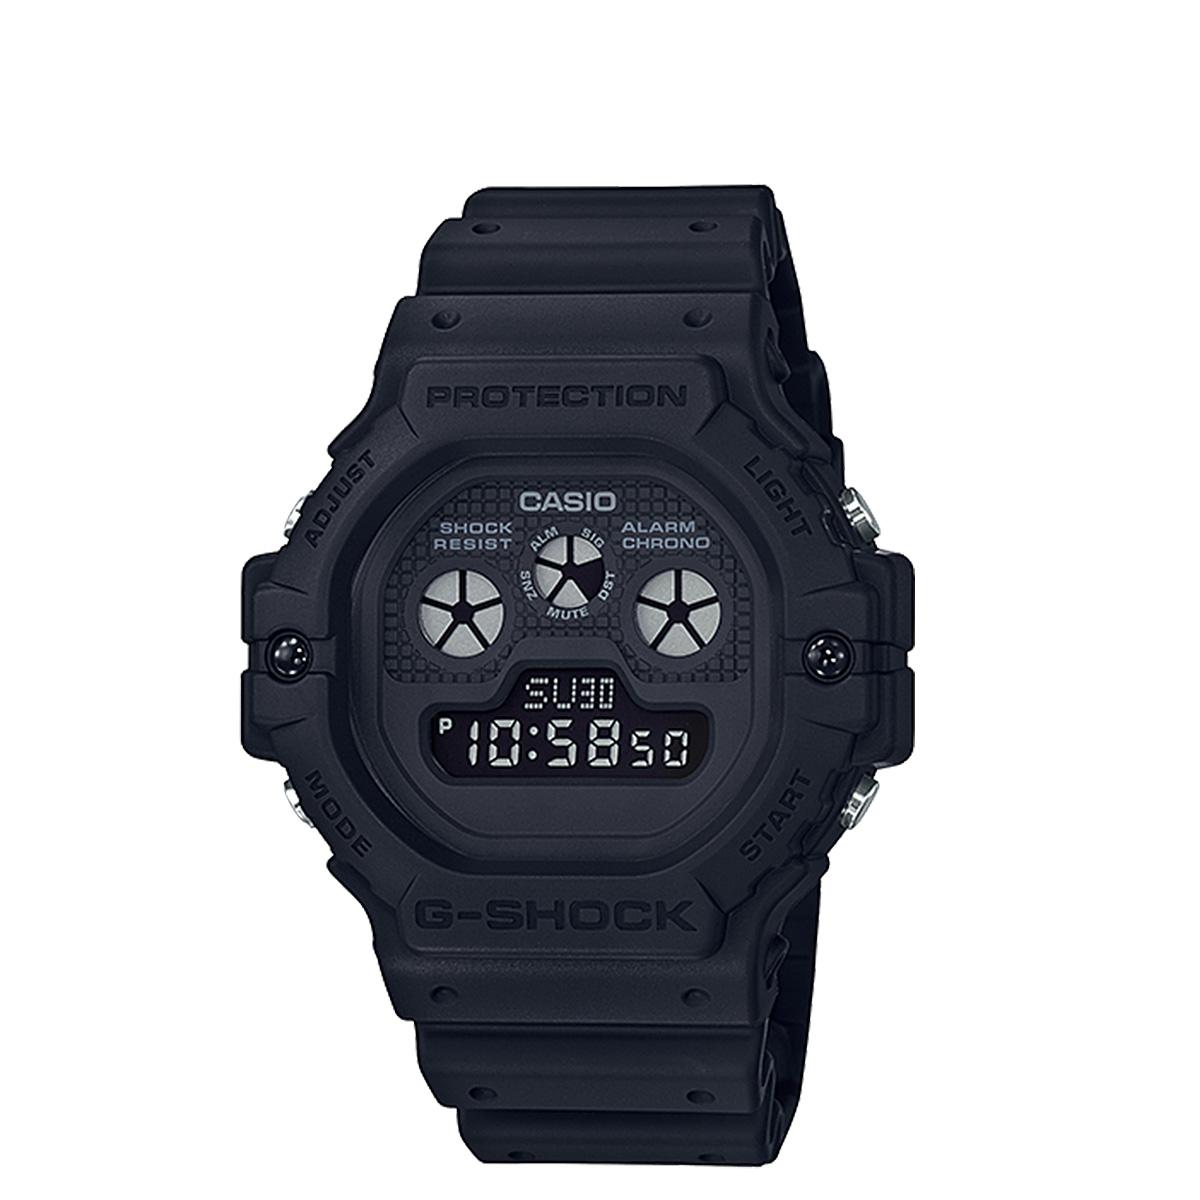 CASIO G-SHOCK カシオ 腕時計 DW-5900BB-1JF ブラック メンズ レディース